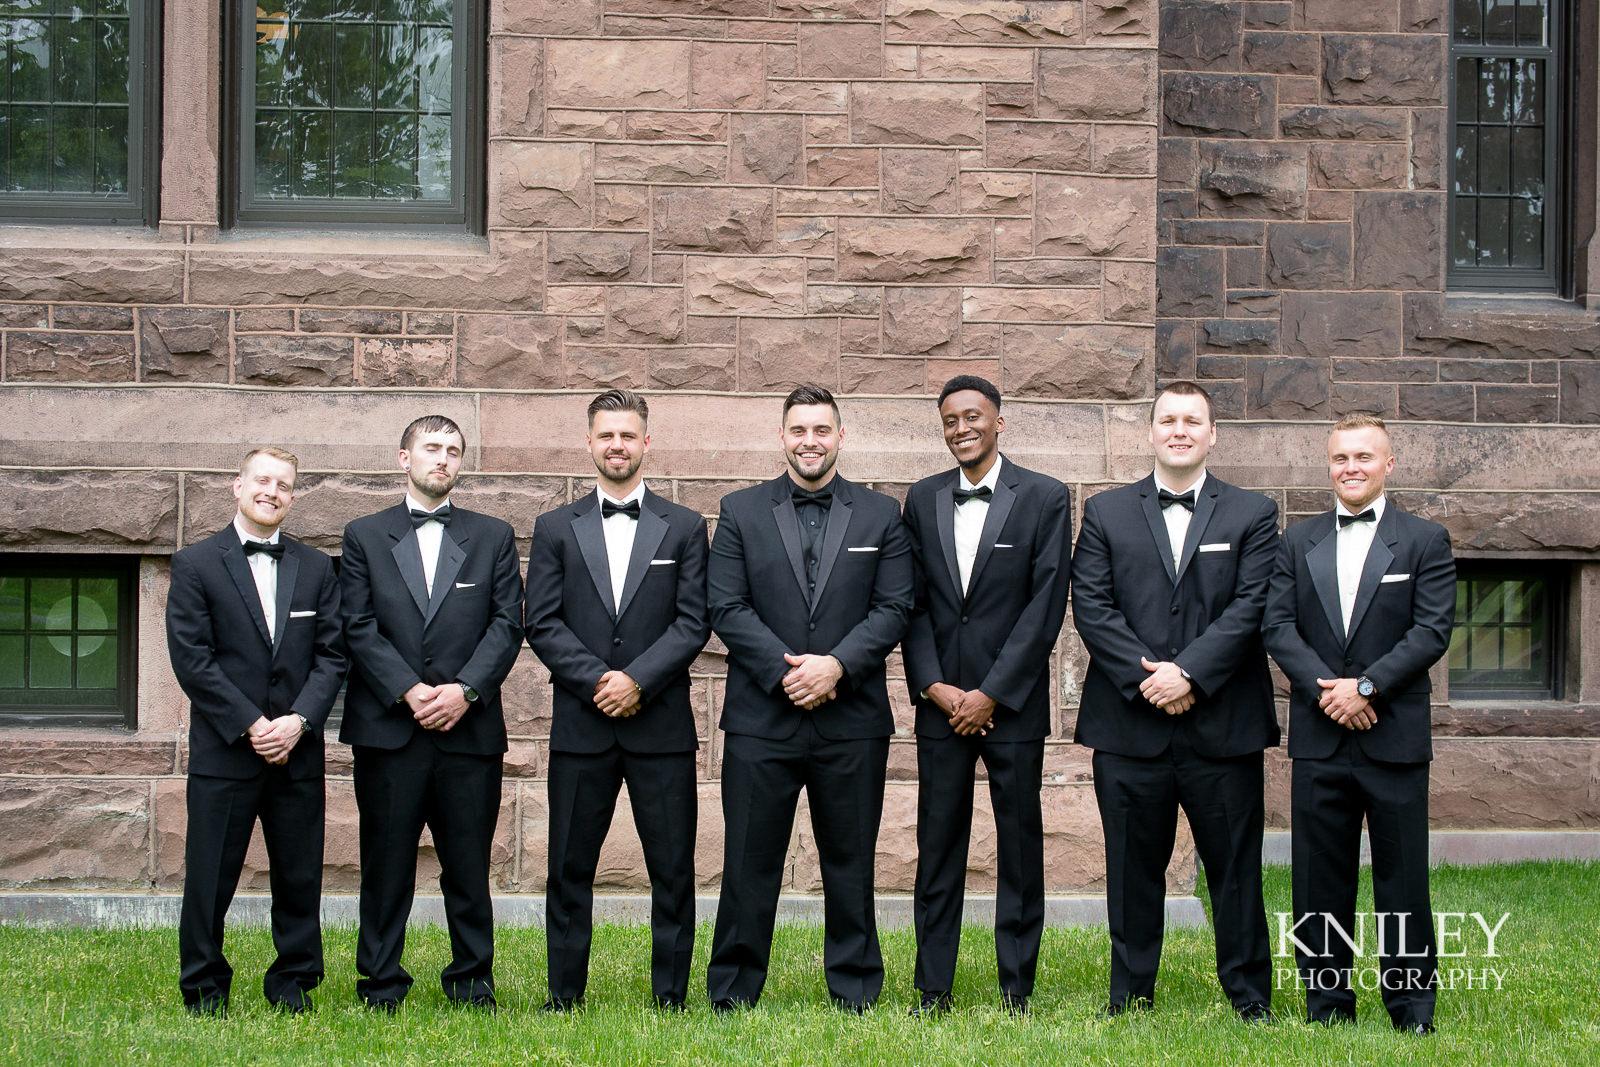 025 - Hotel Henry Buffalo NY Wedding Pictures -DSC_0134(2).jpg